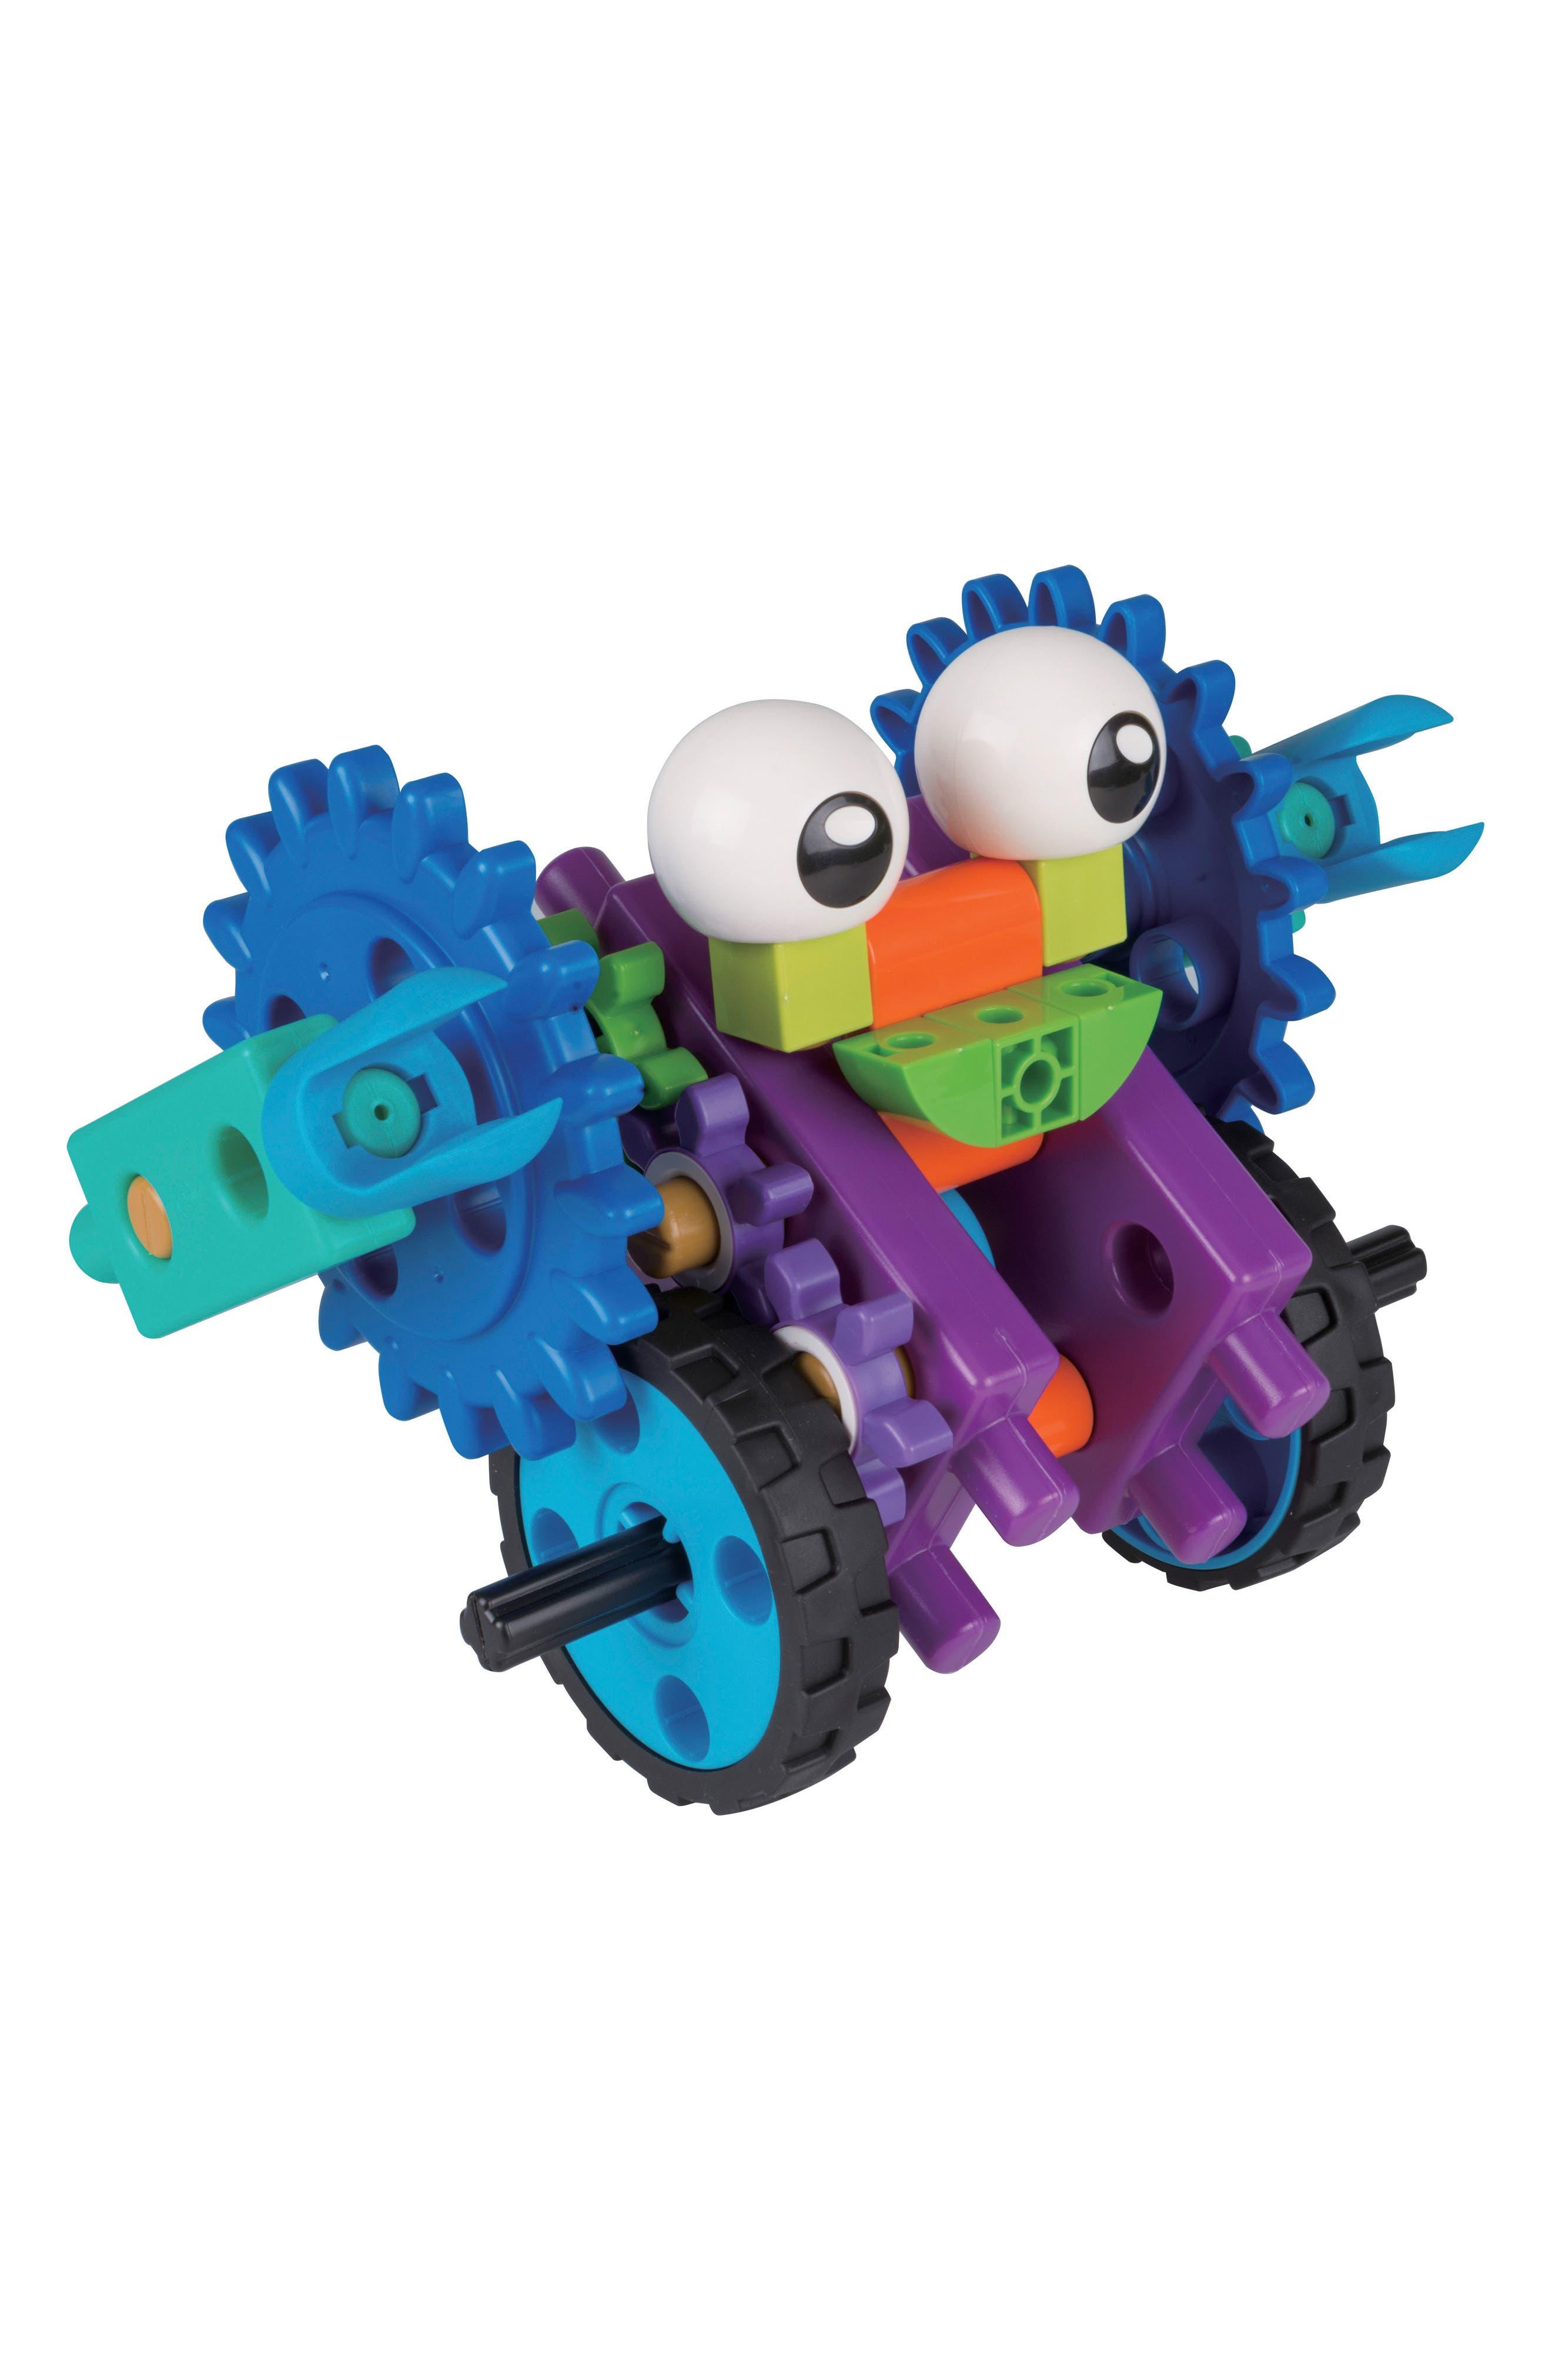 Robot Engineer Building Set & Storybook,                             Alternate thumbnail 3, color,                             Blue